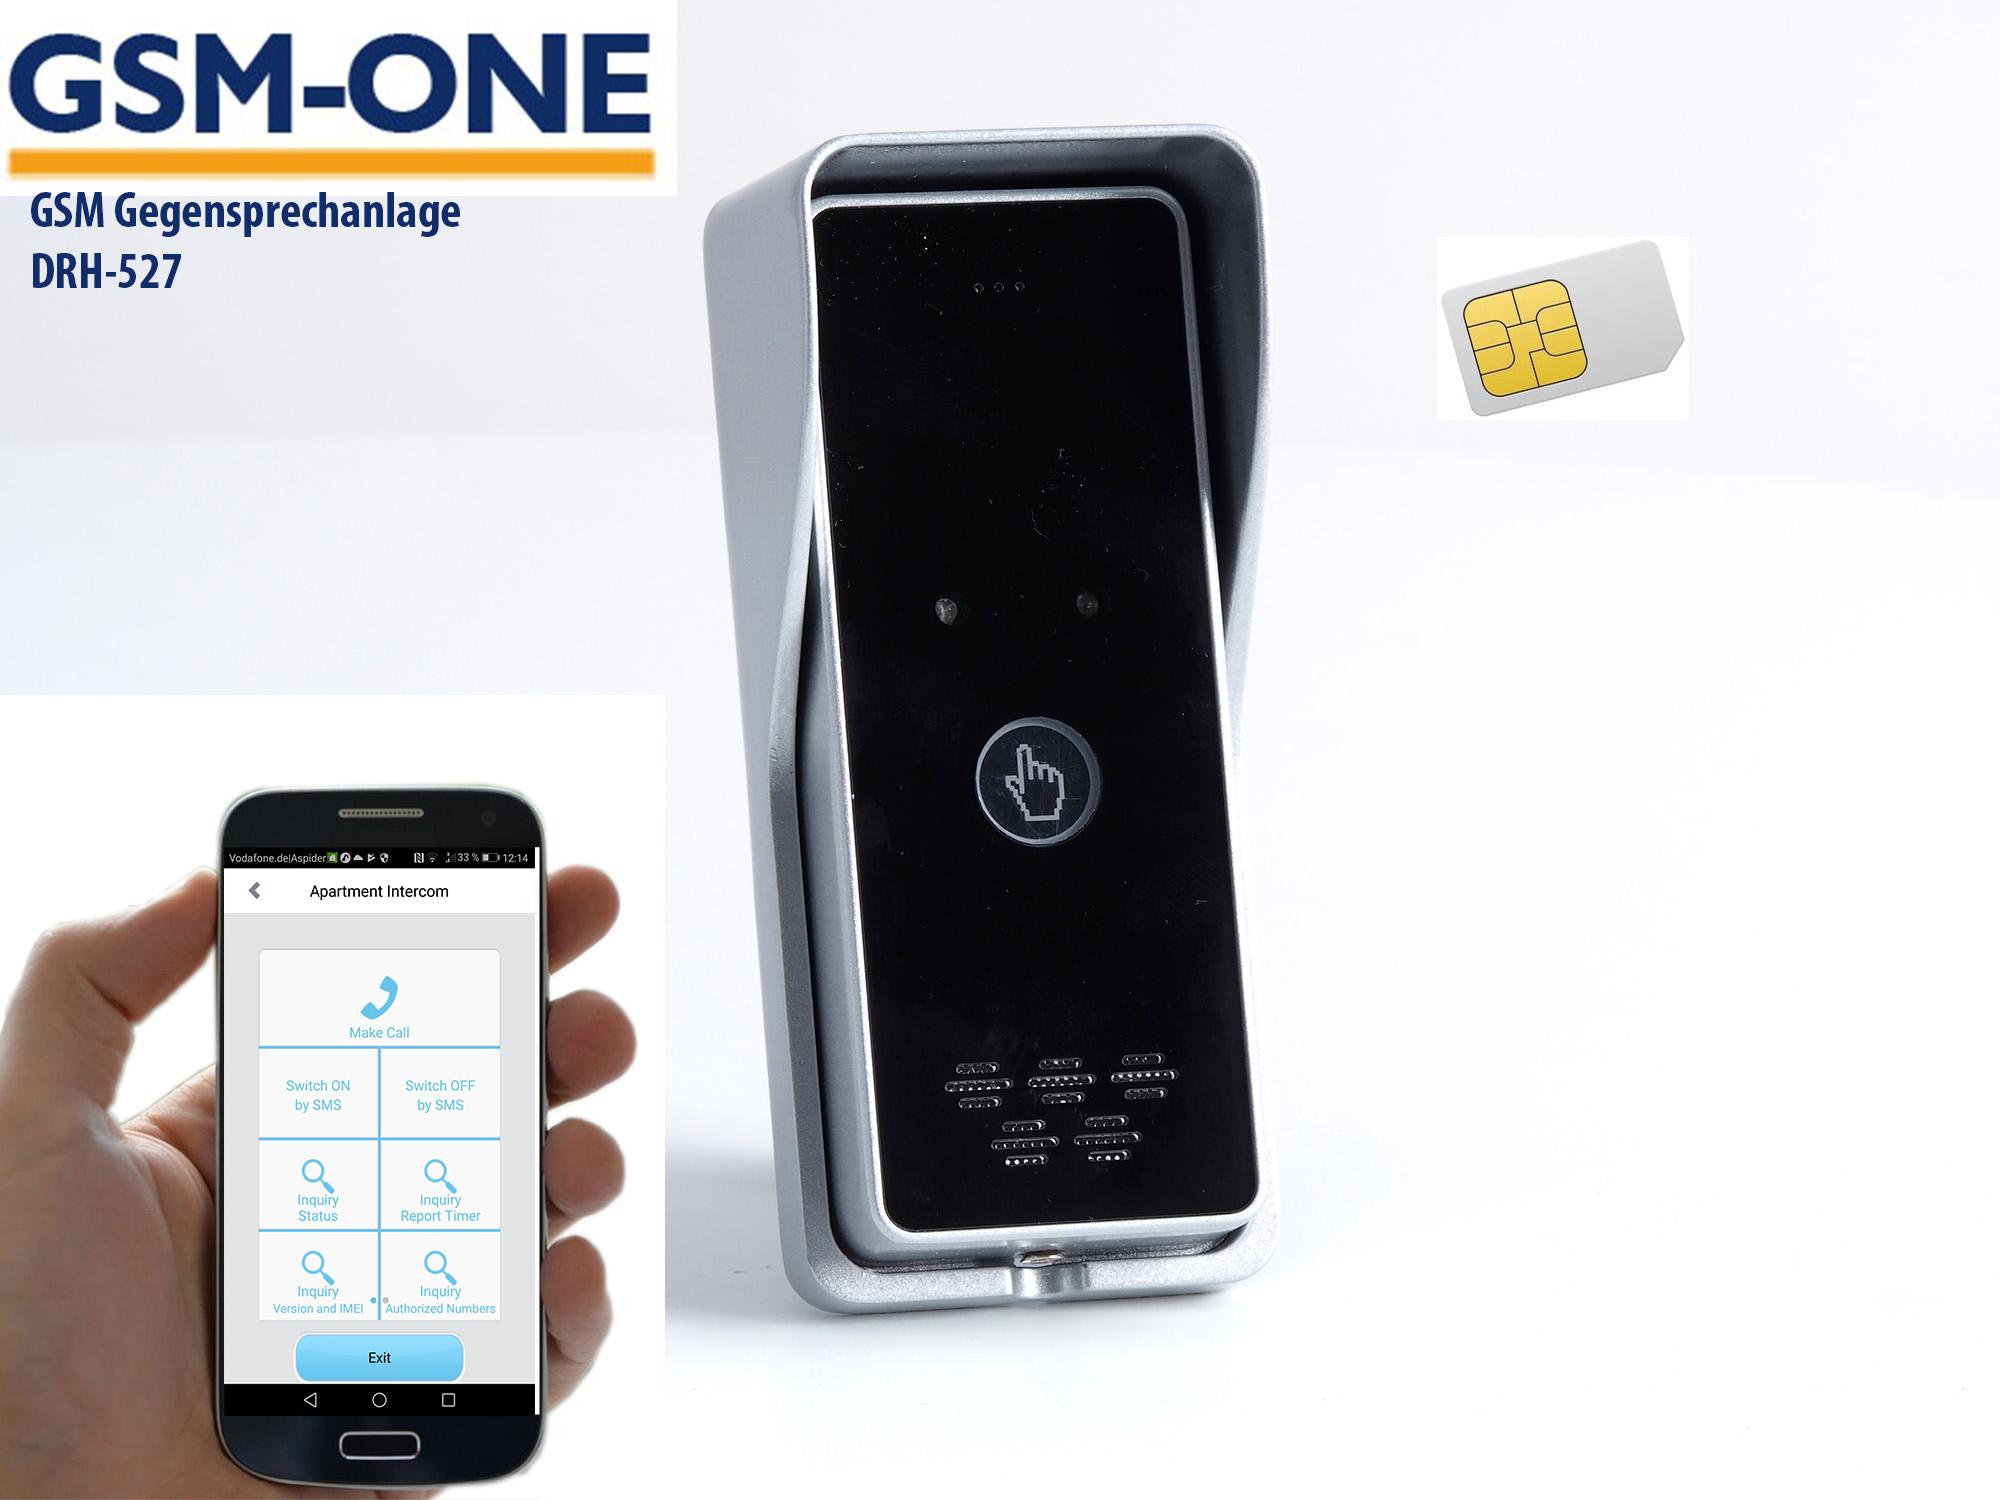 GSM Gegensprechanlage + Fern- Türöffner DRH-527 inkl. Smartphone App (Android u. IOS)